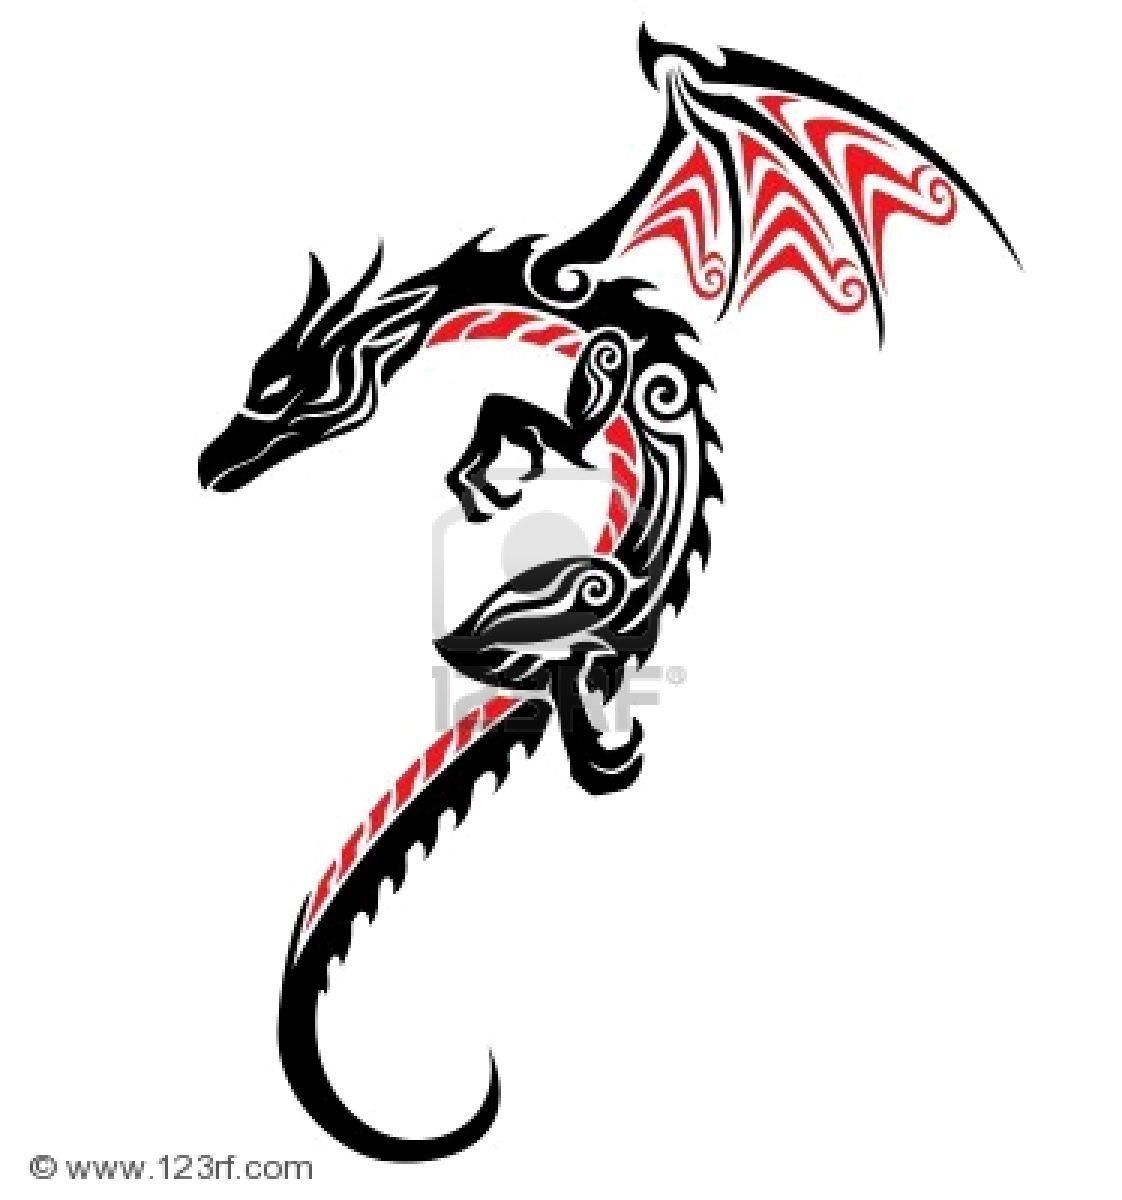 Dragon Head Tribal Tattoo Designs free image